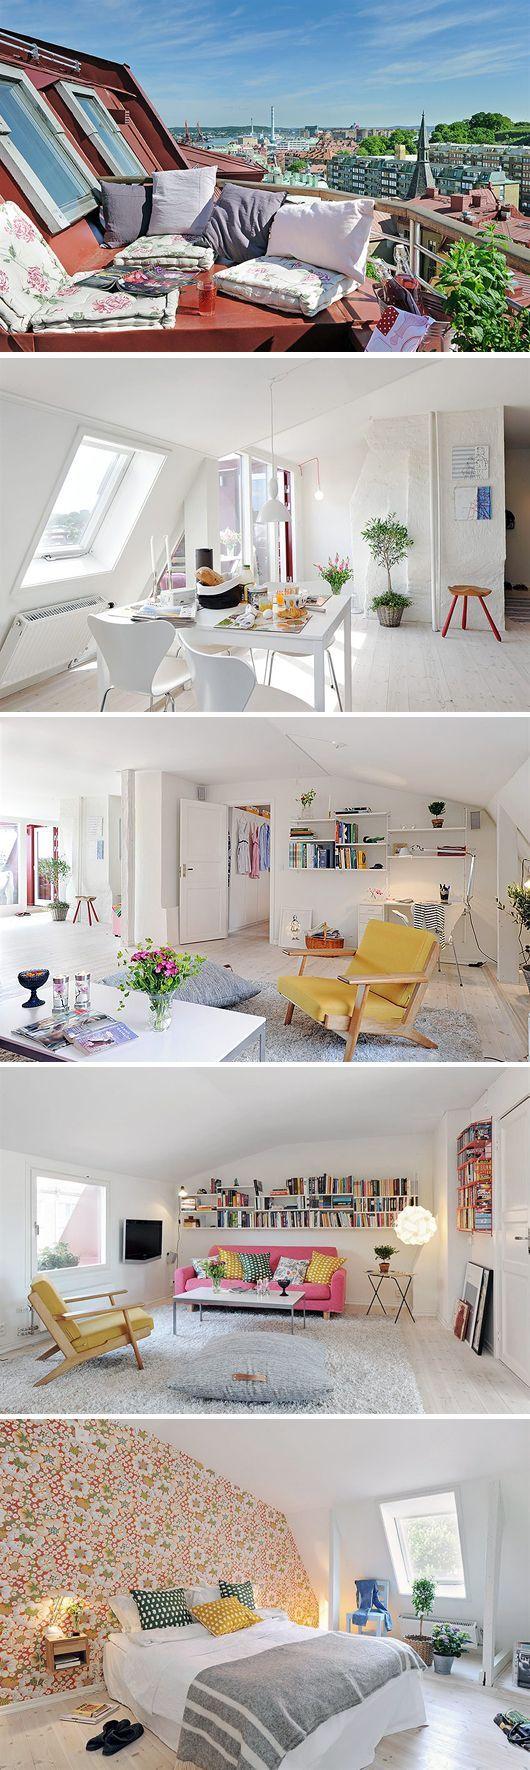 sous les #home design ideas #home interior design 2012 #luxury house design  http://home-design-collections.lemoncoin.org